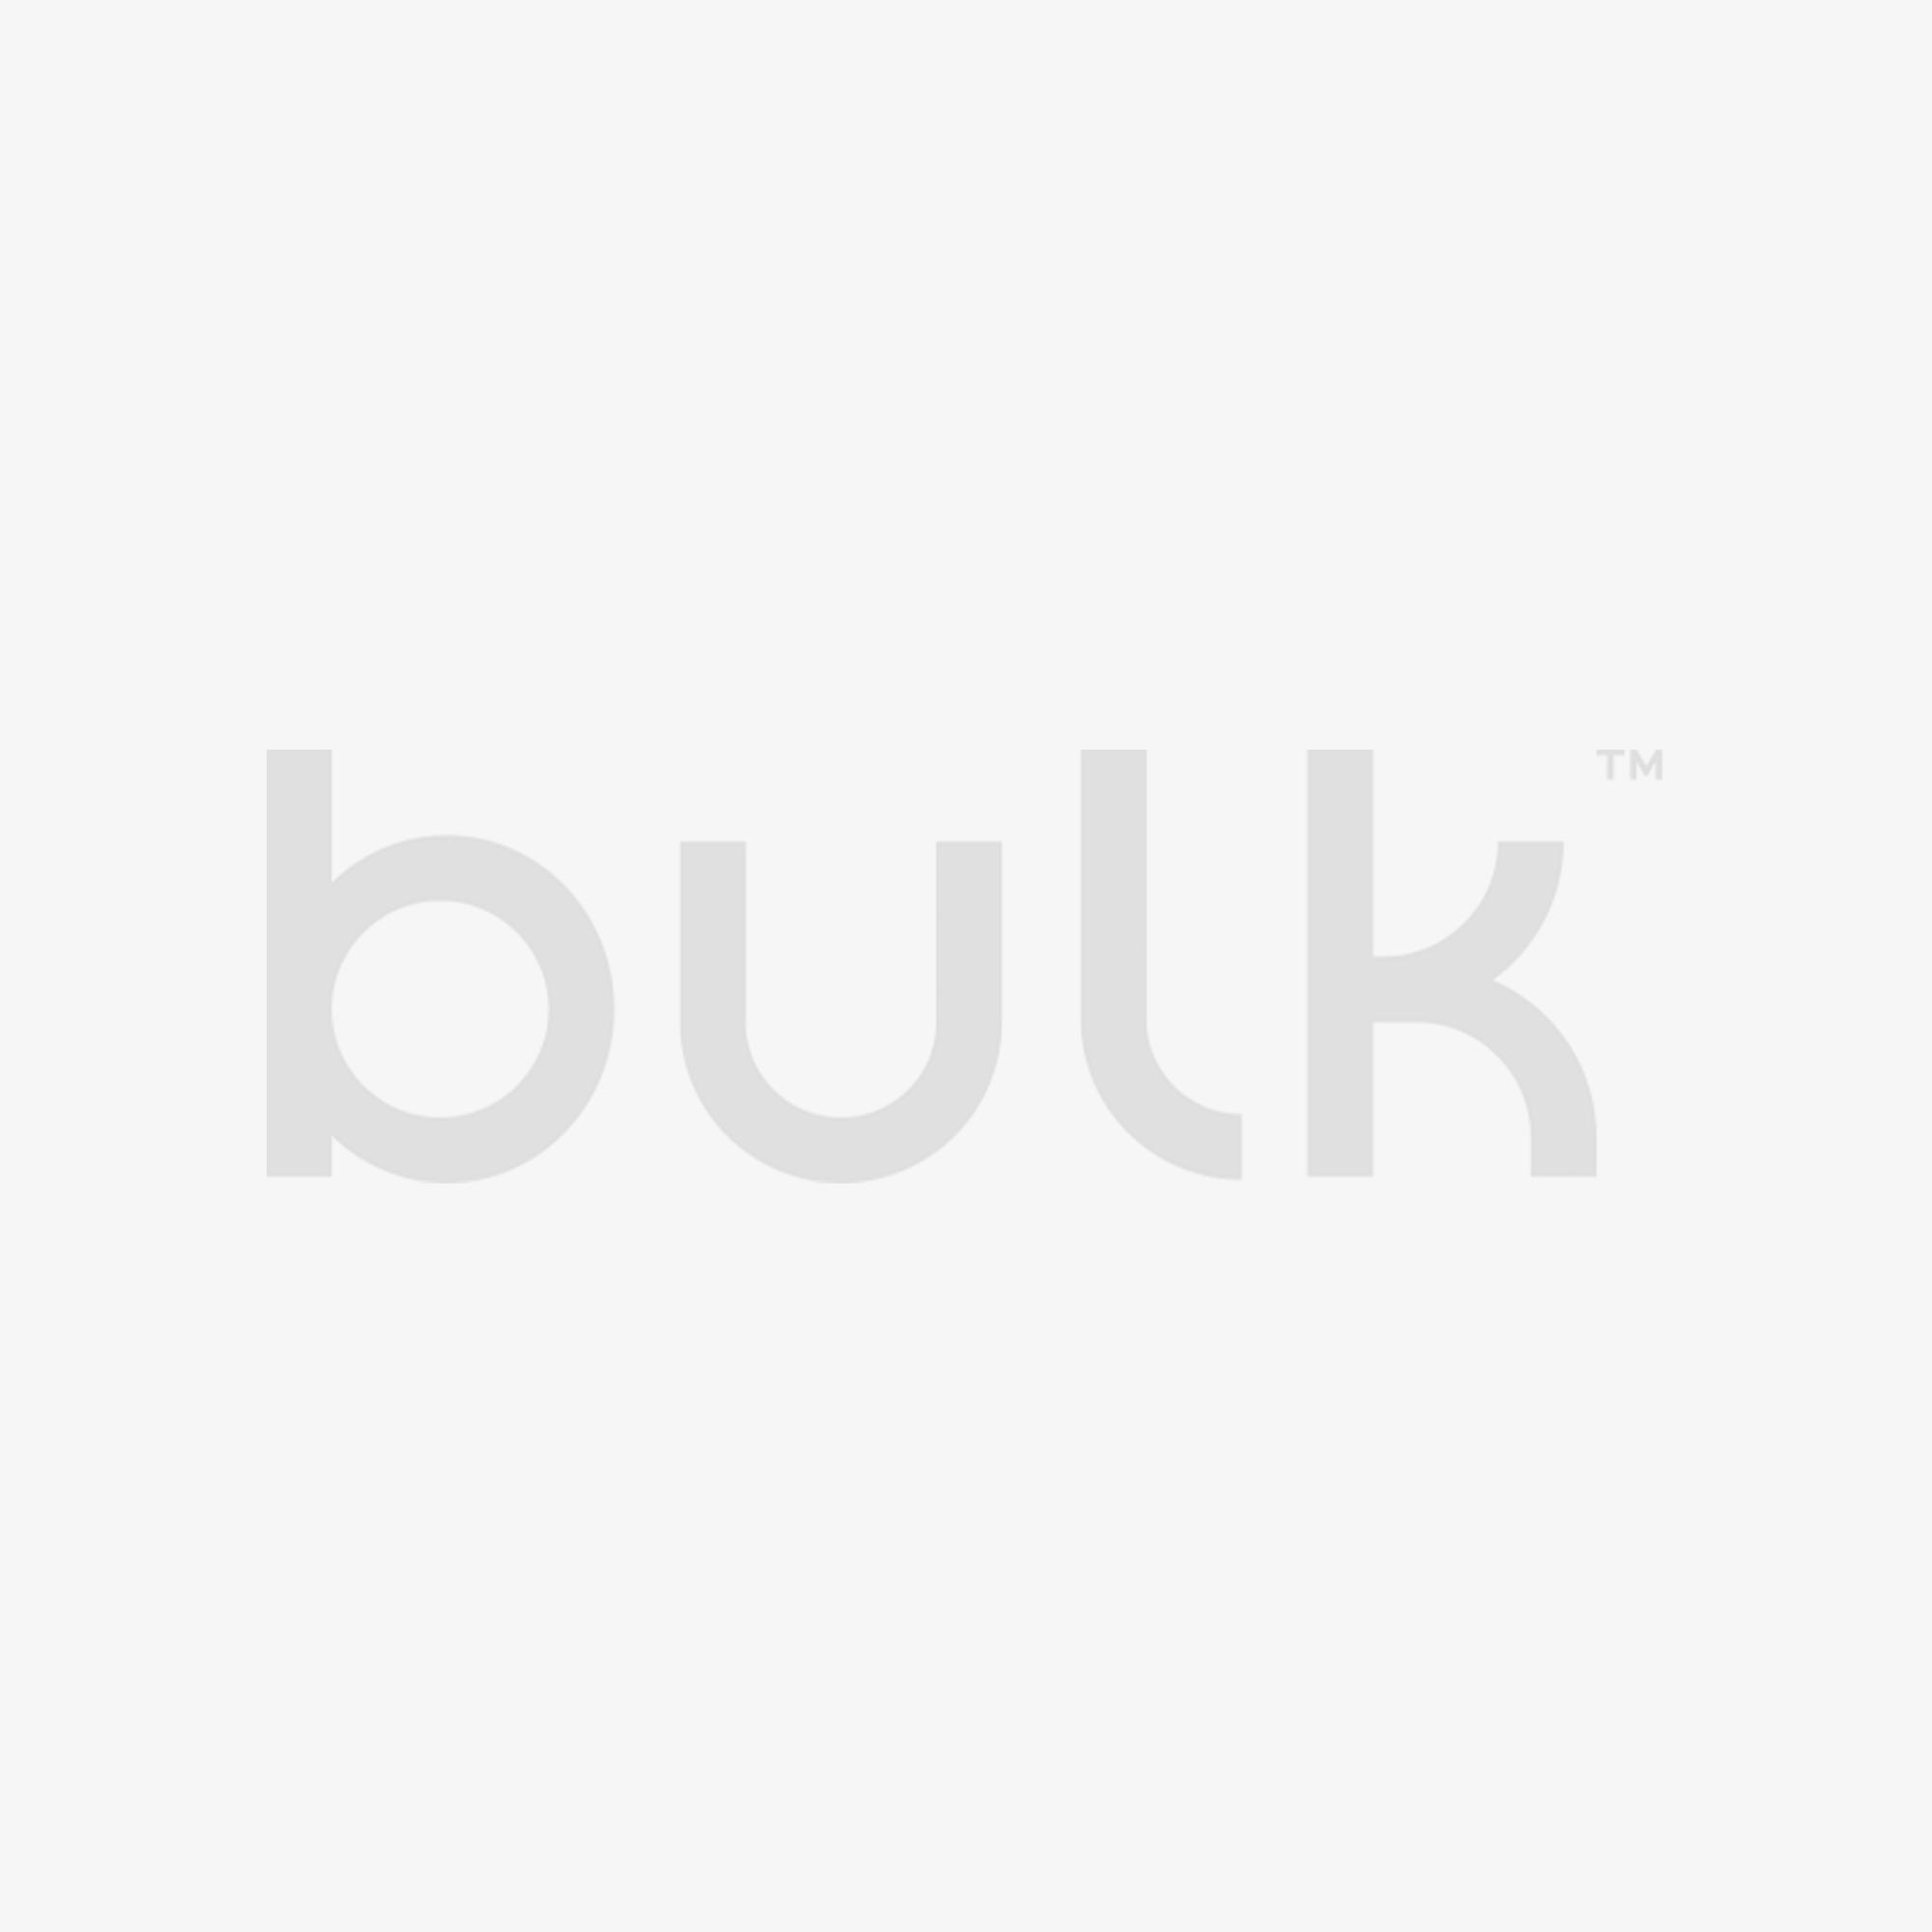 SPORTS MULTI AM:PM™ - BULK POWDERS™